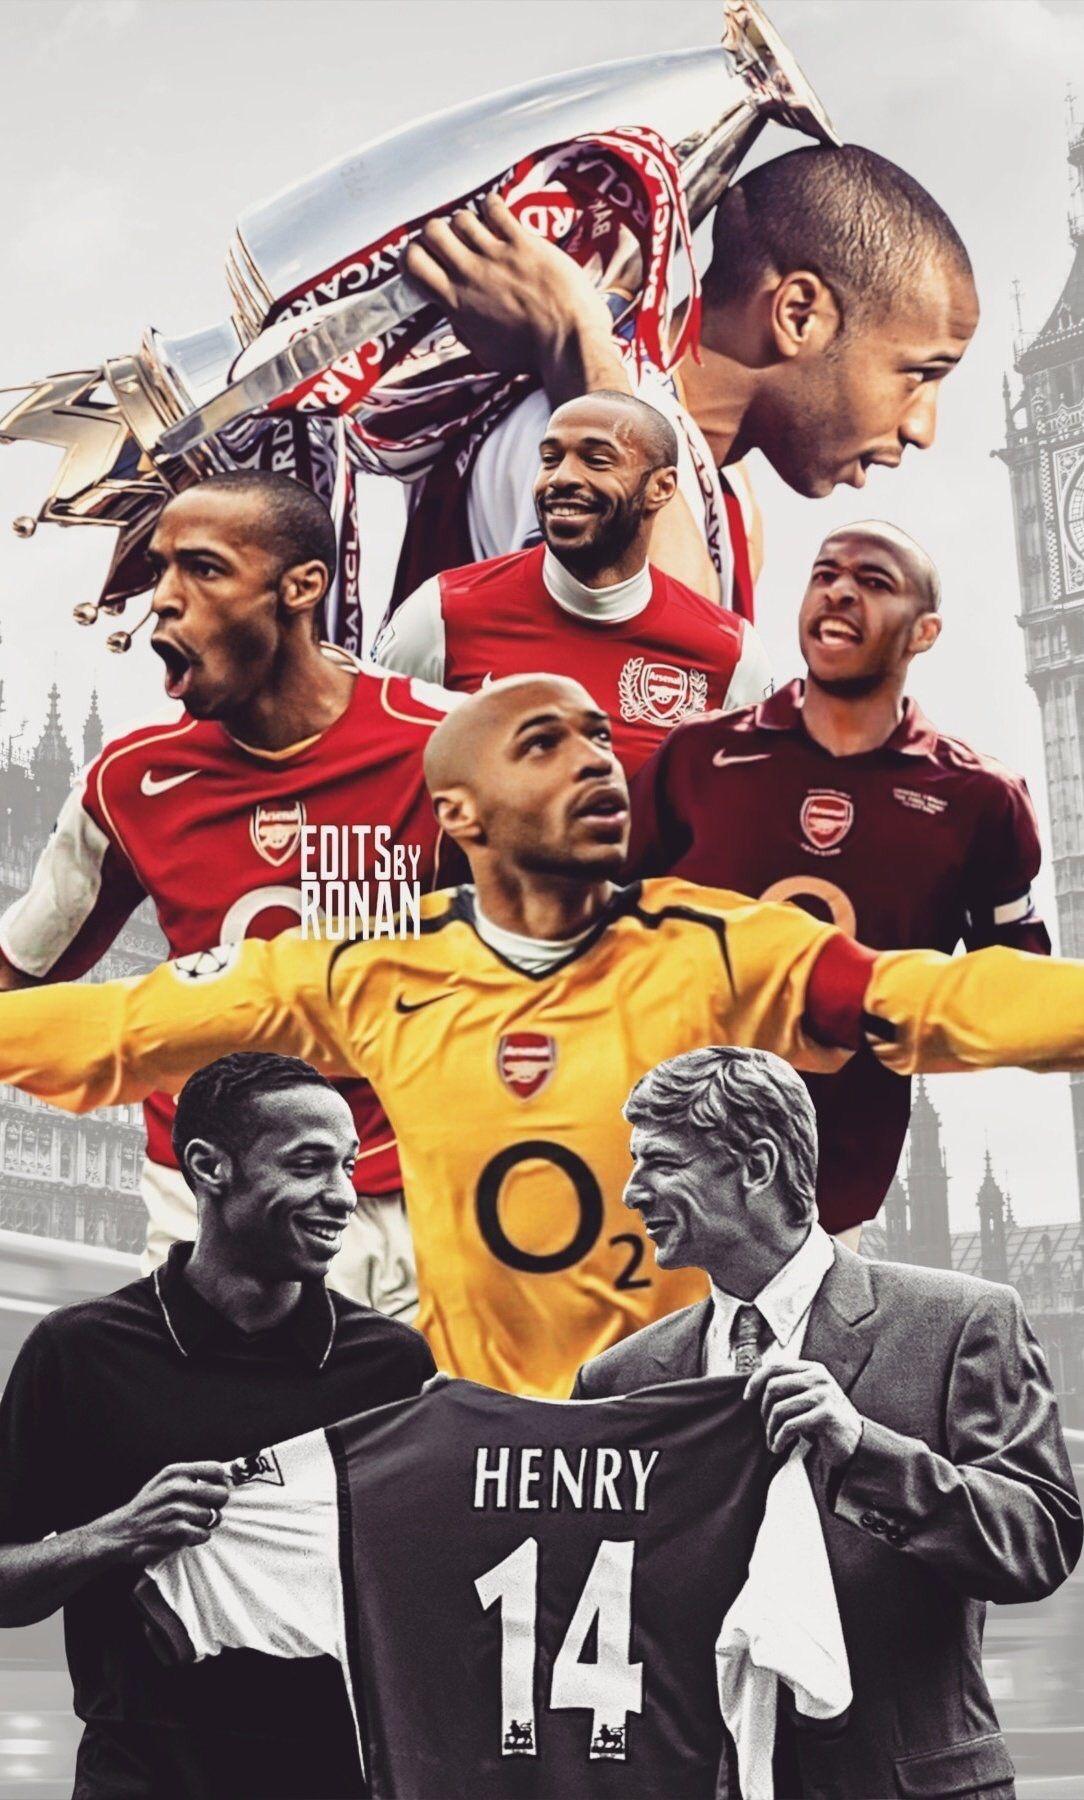 Twitter Editsbyronan Wallpaper Art Footballart Soccerart Soccer Football Arsenal Jogadores De Futebol Futebol Futebol Arte